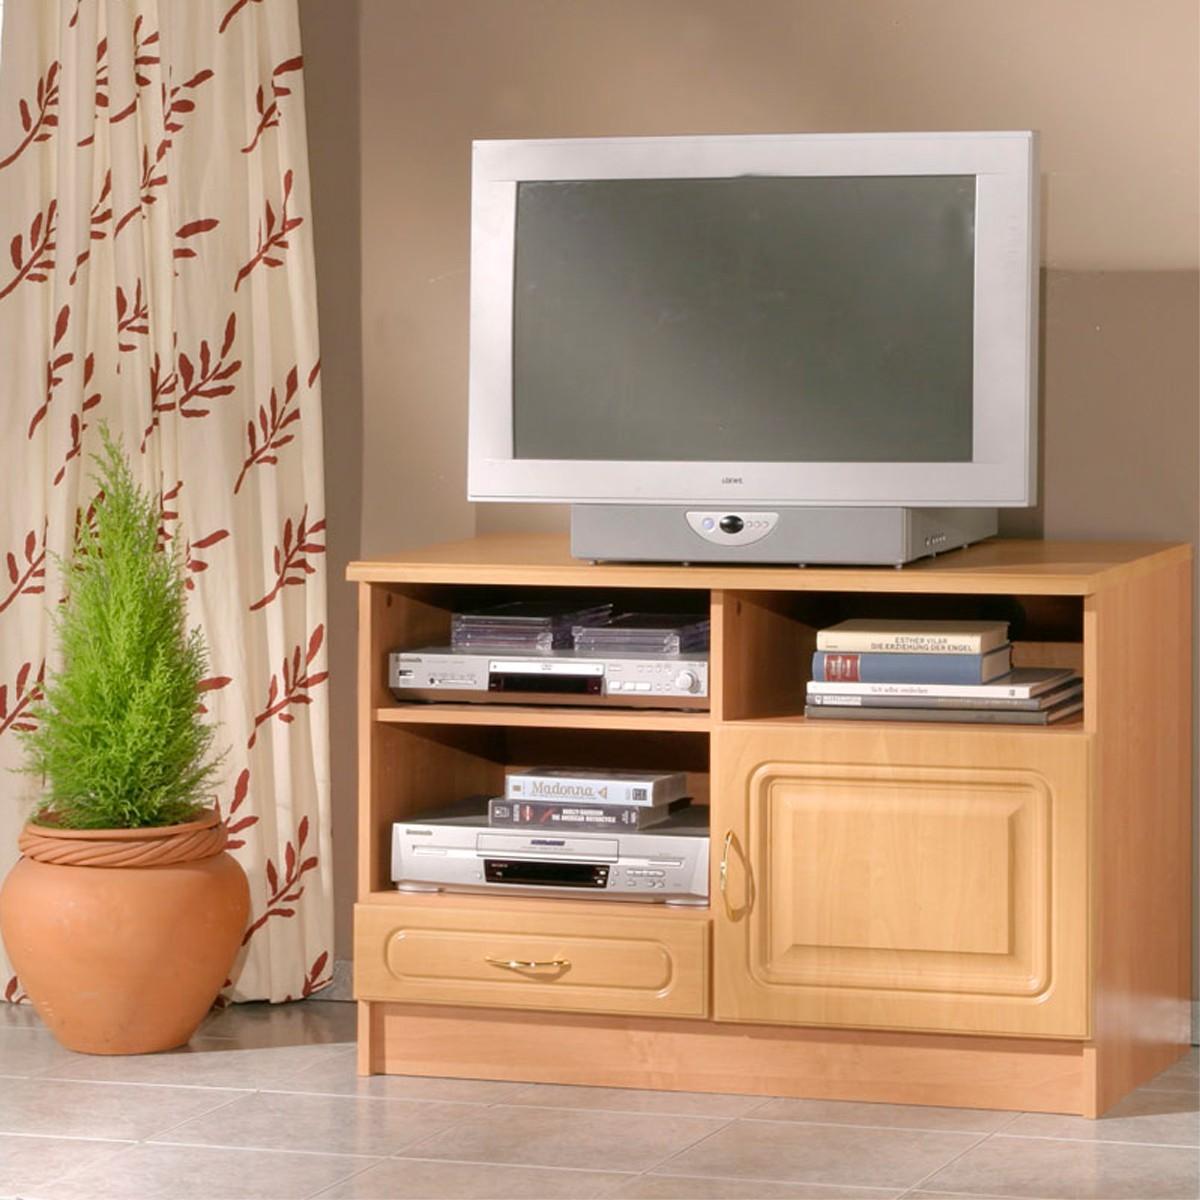 hifi turm media aus aluminium mit 4 glasboeden b2b trade. Black Bedroom Furniture Sets. Home Design Ideas